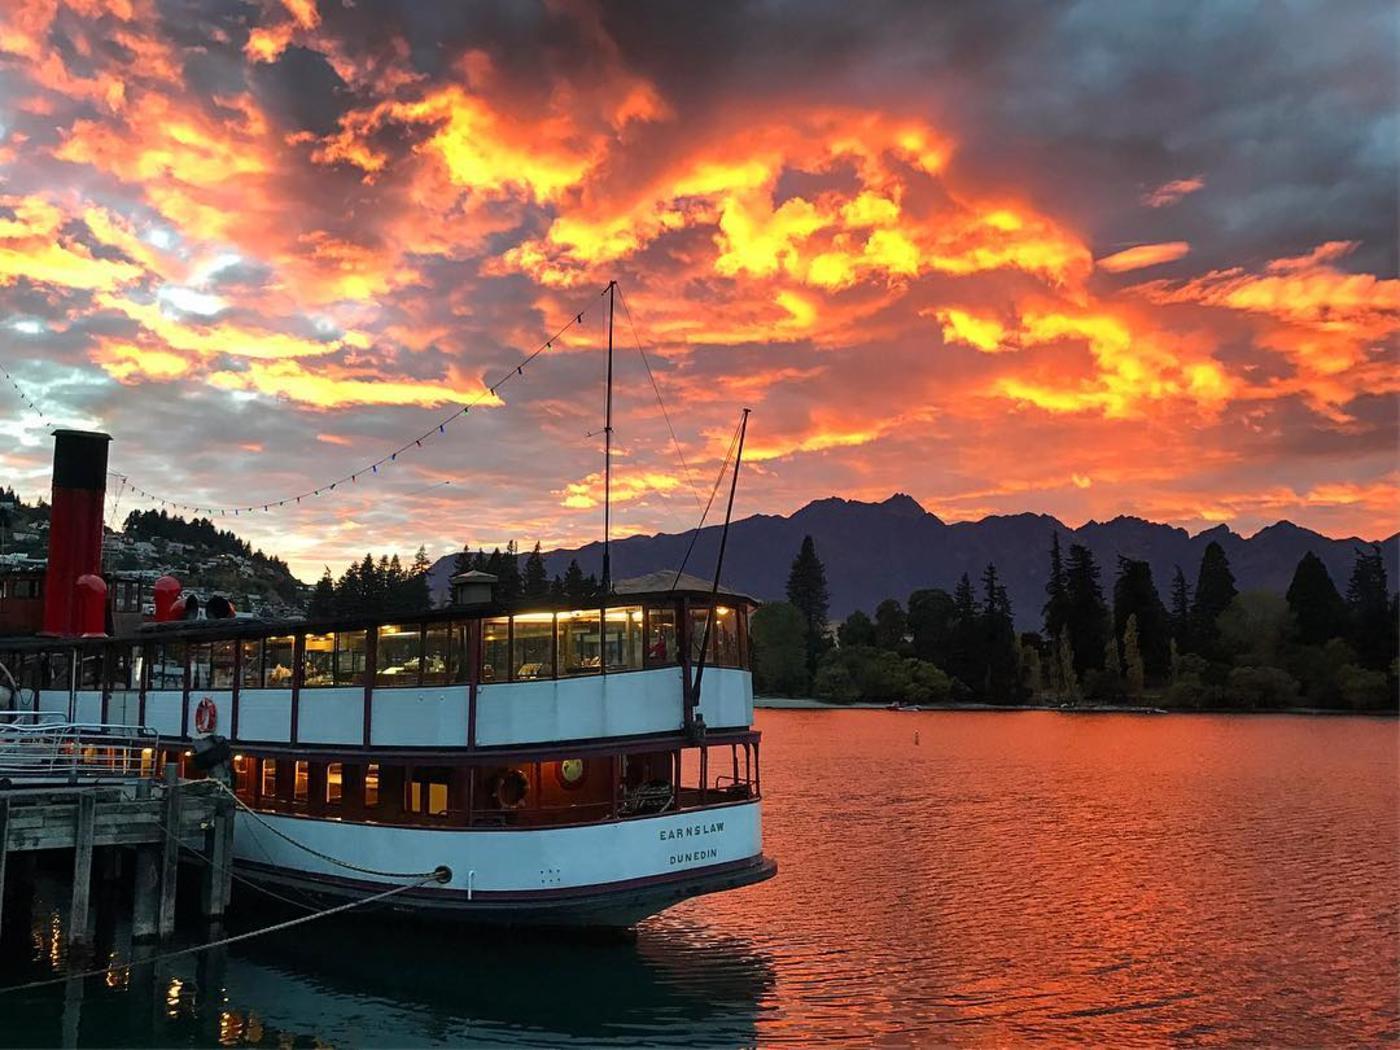 Queenstown sunset from lake esplanade